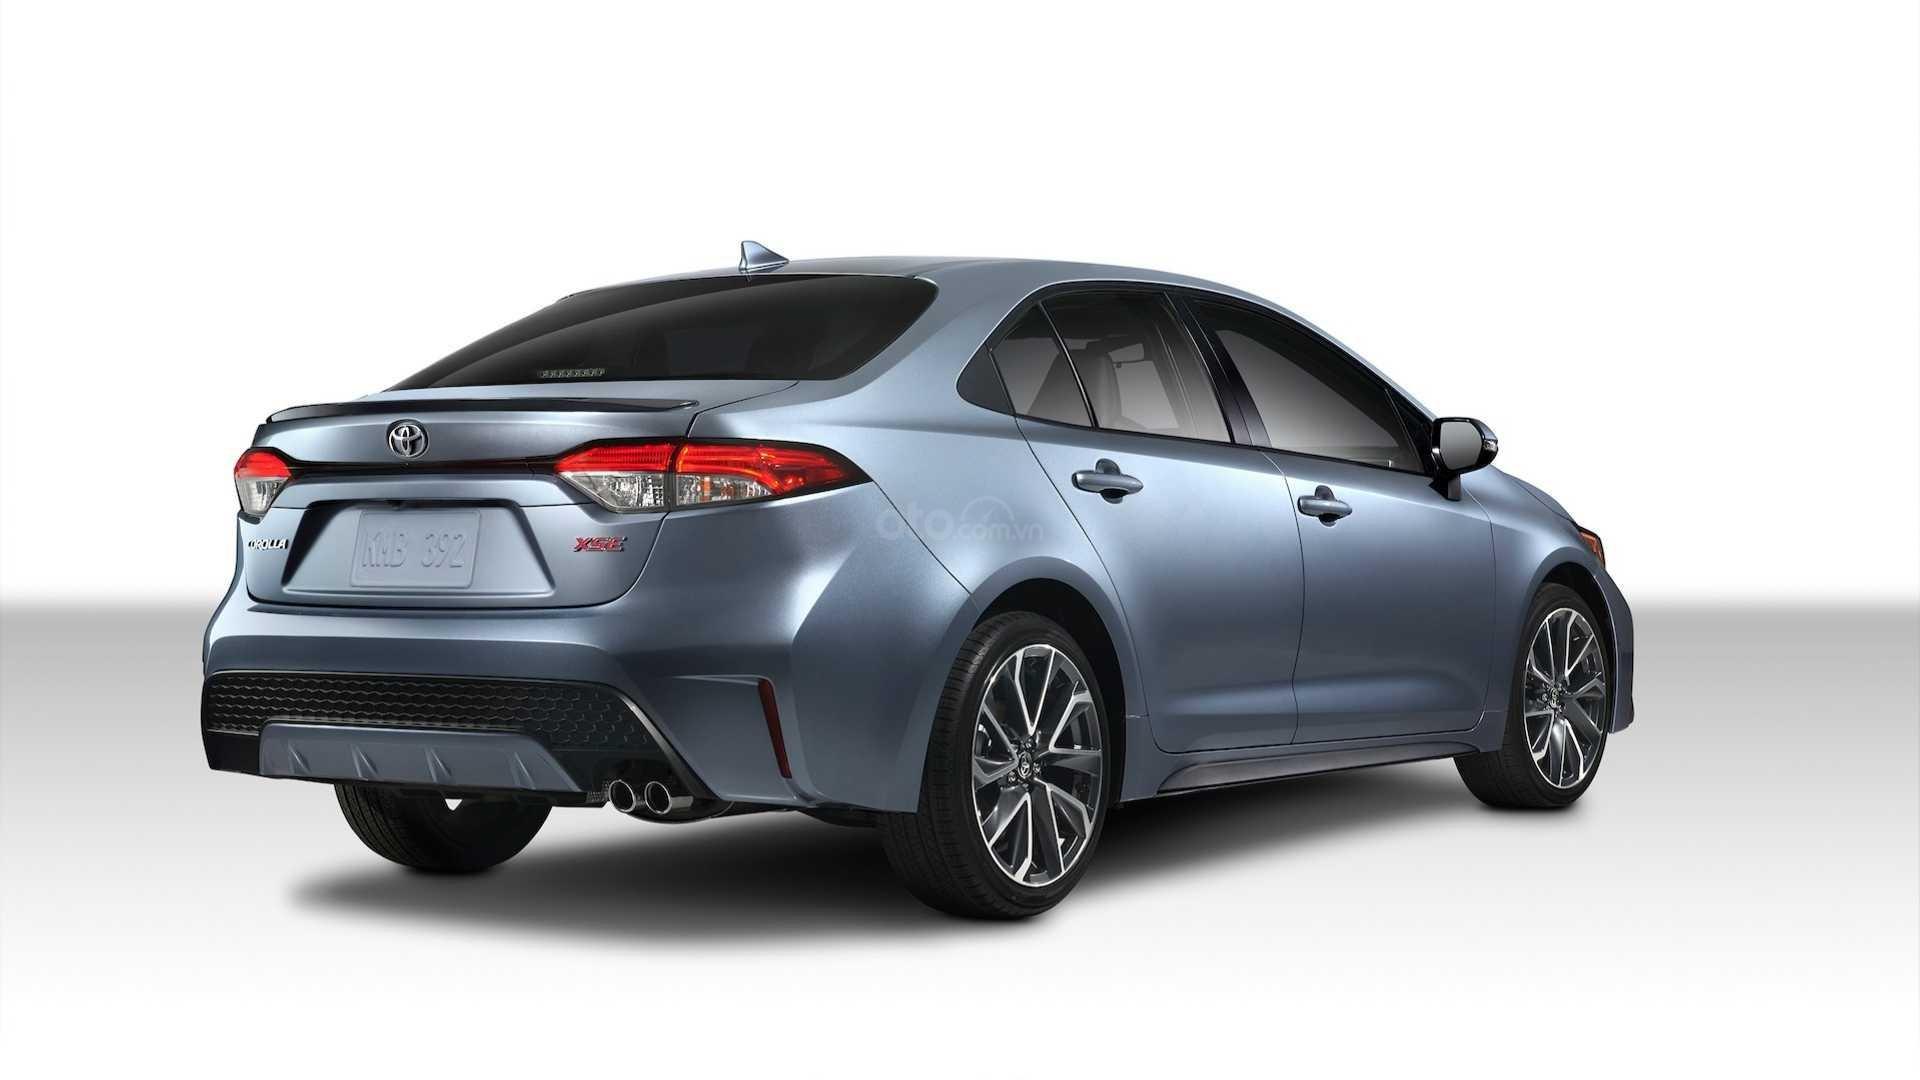 Góc 3/4 thân xe Toyota Corolla 2020 sedan